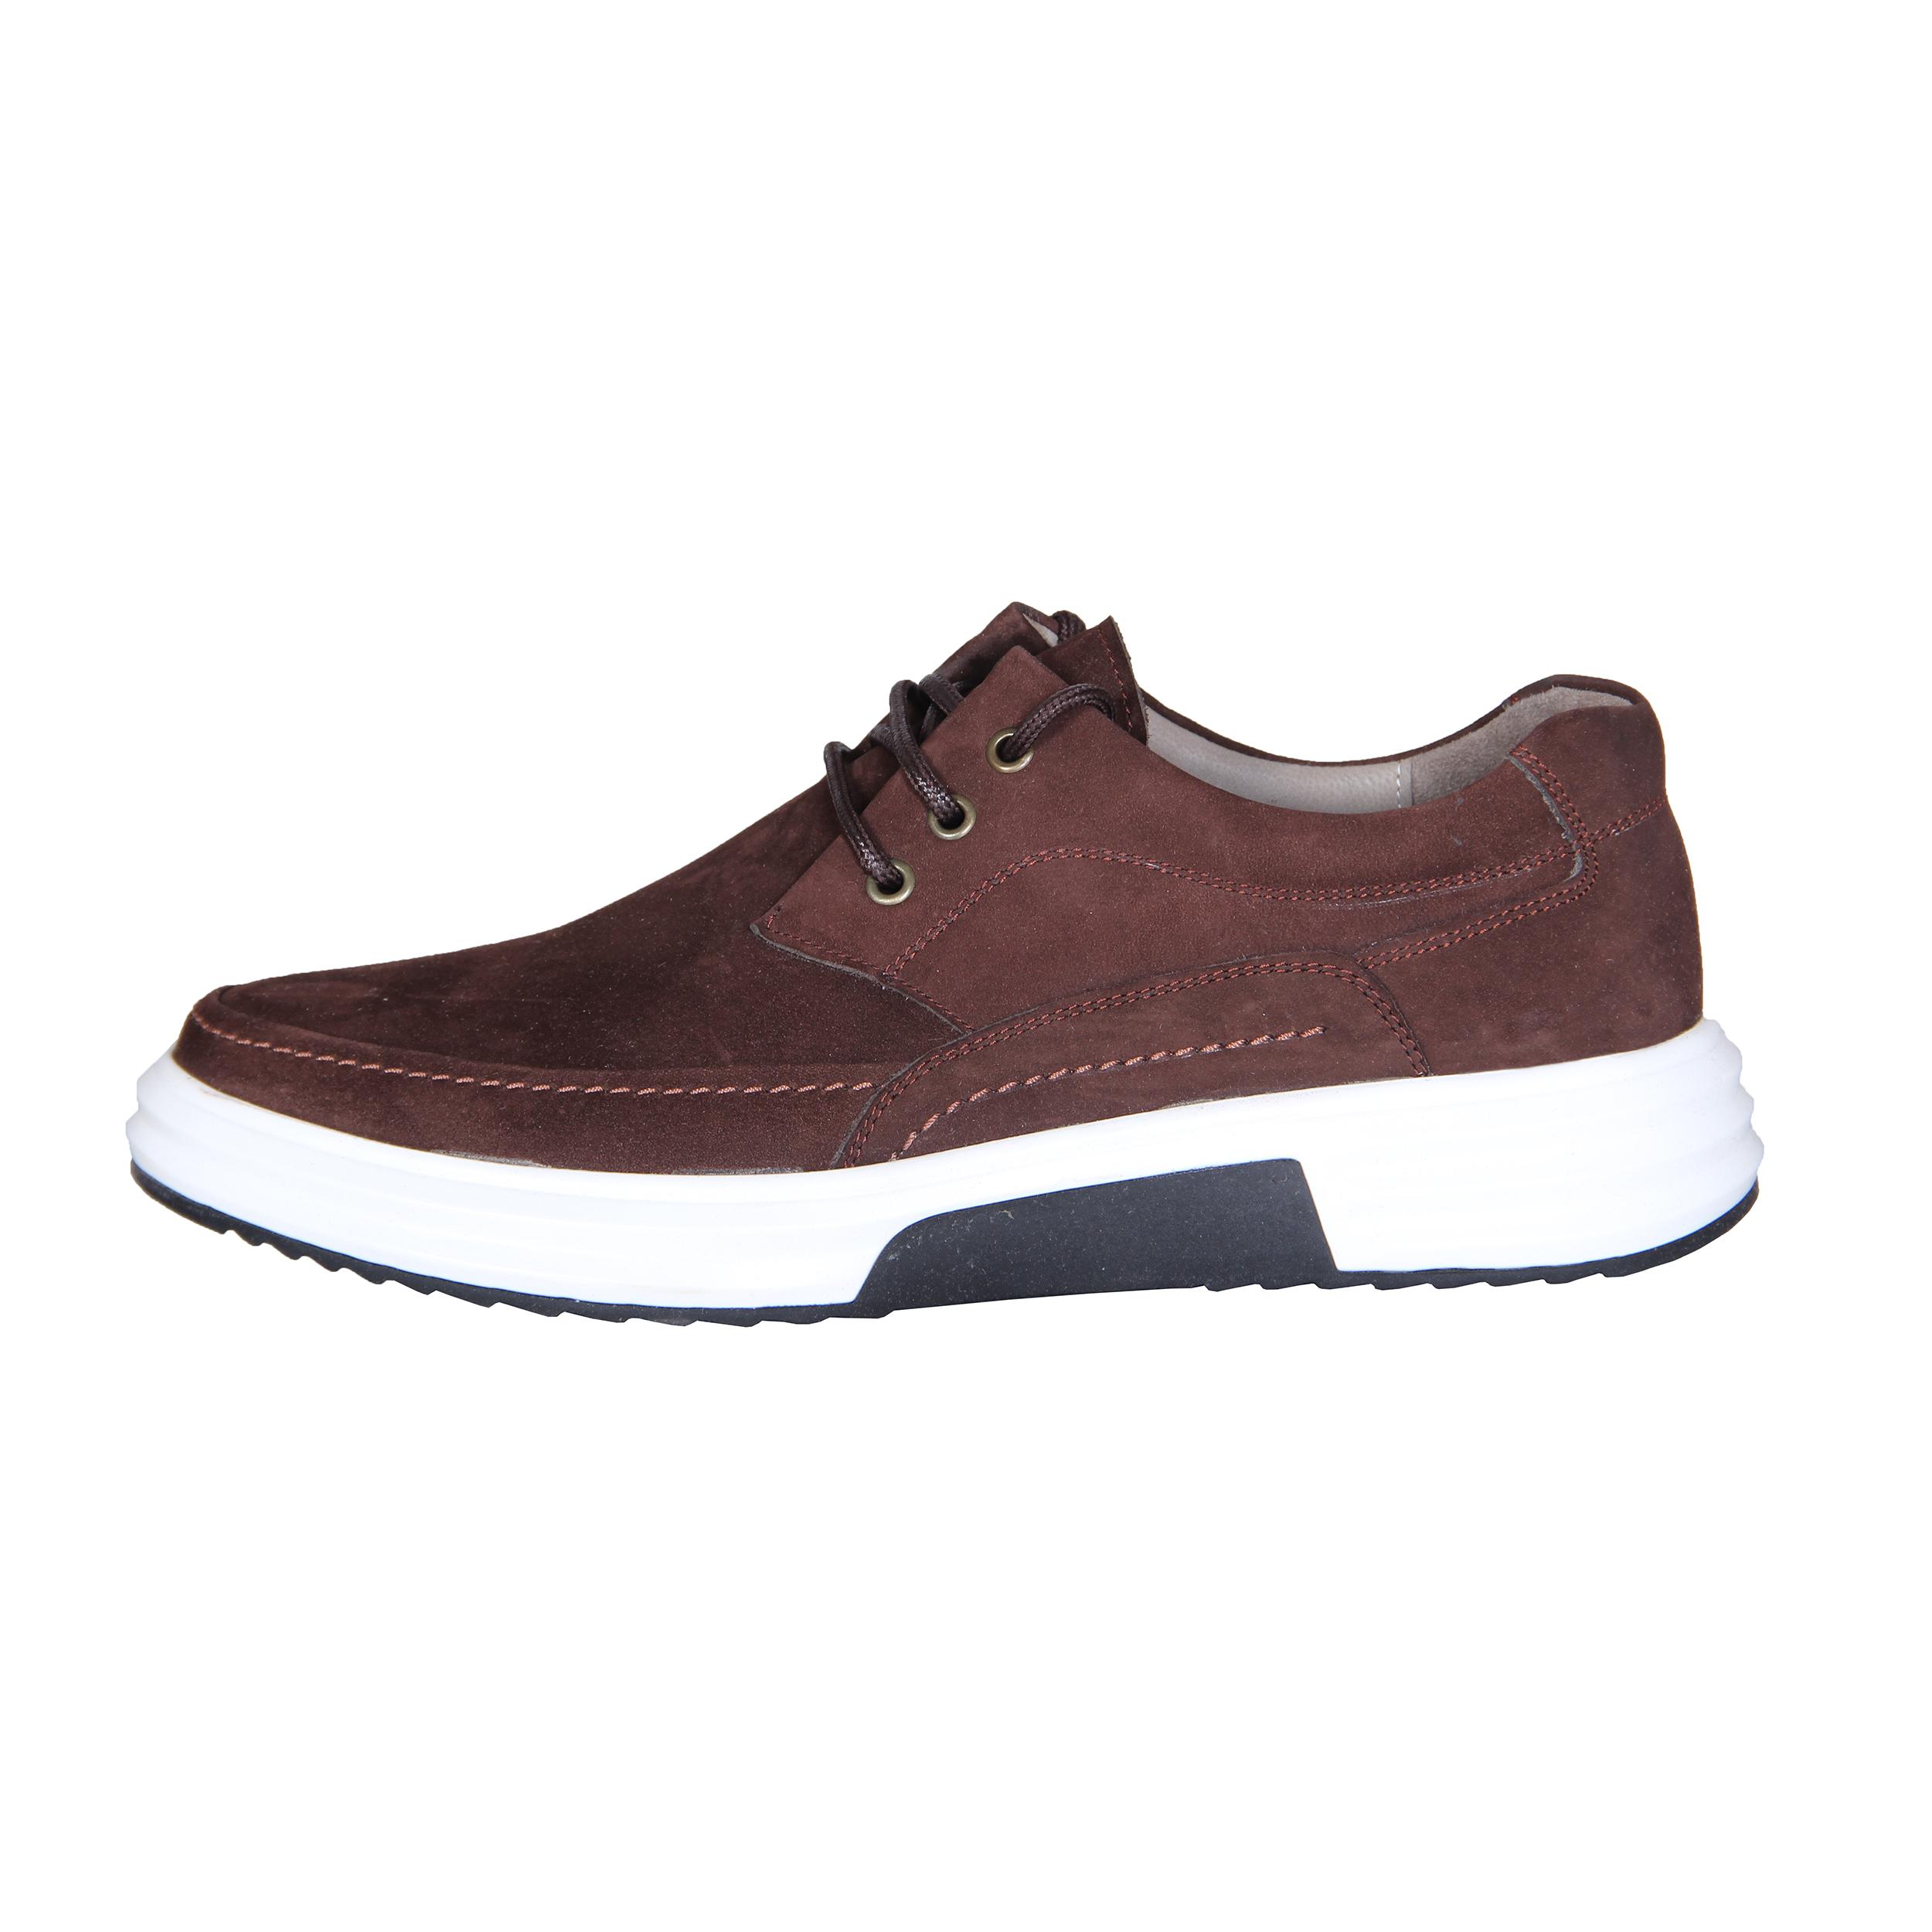 SHAHRECHARM men's casual shoes , F6047-3 Model